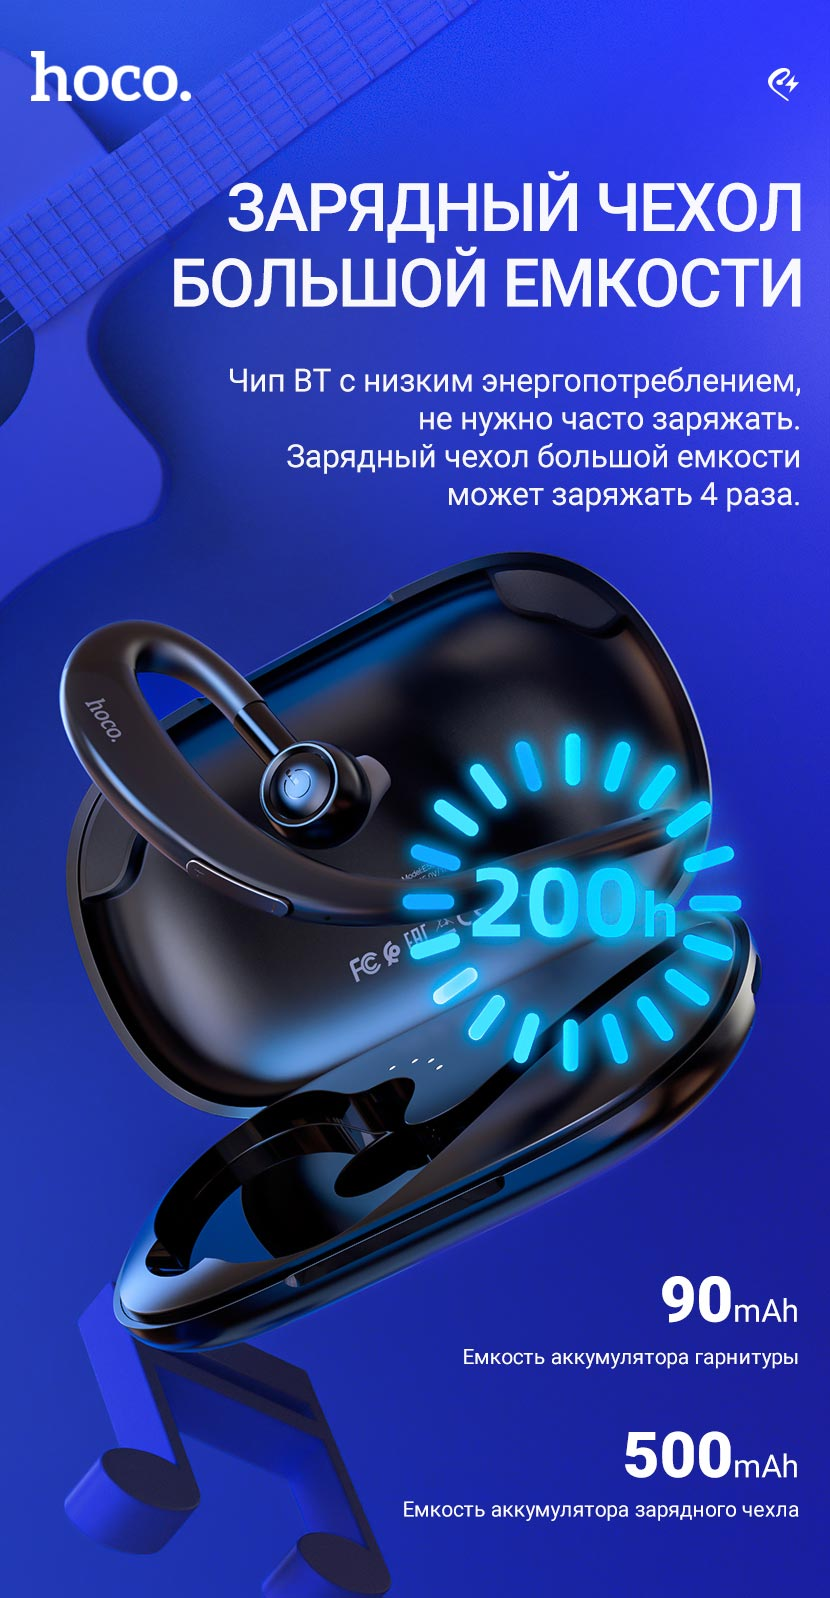 hoco news e56 shine business wireless headset case ru